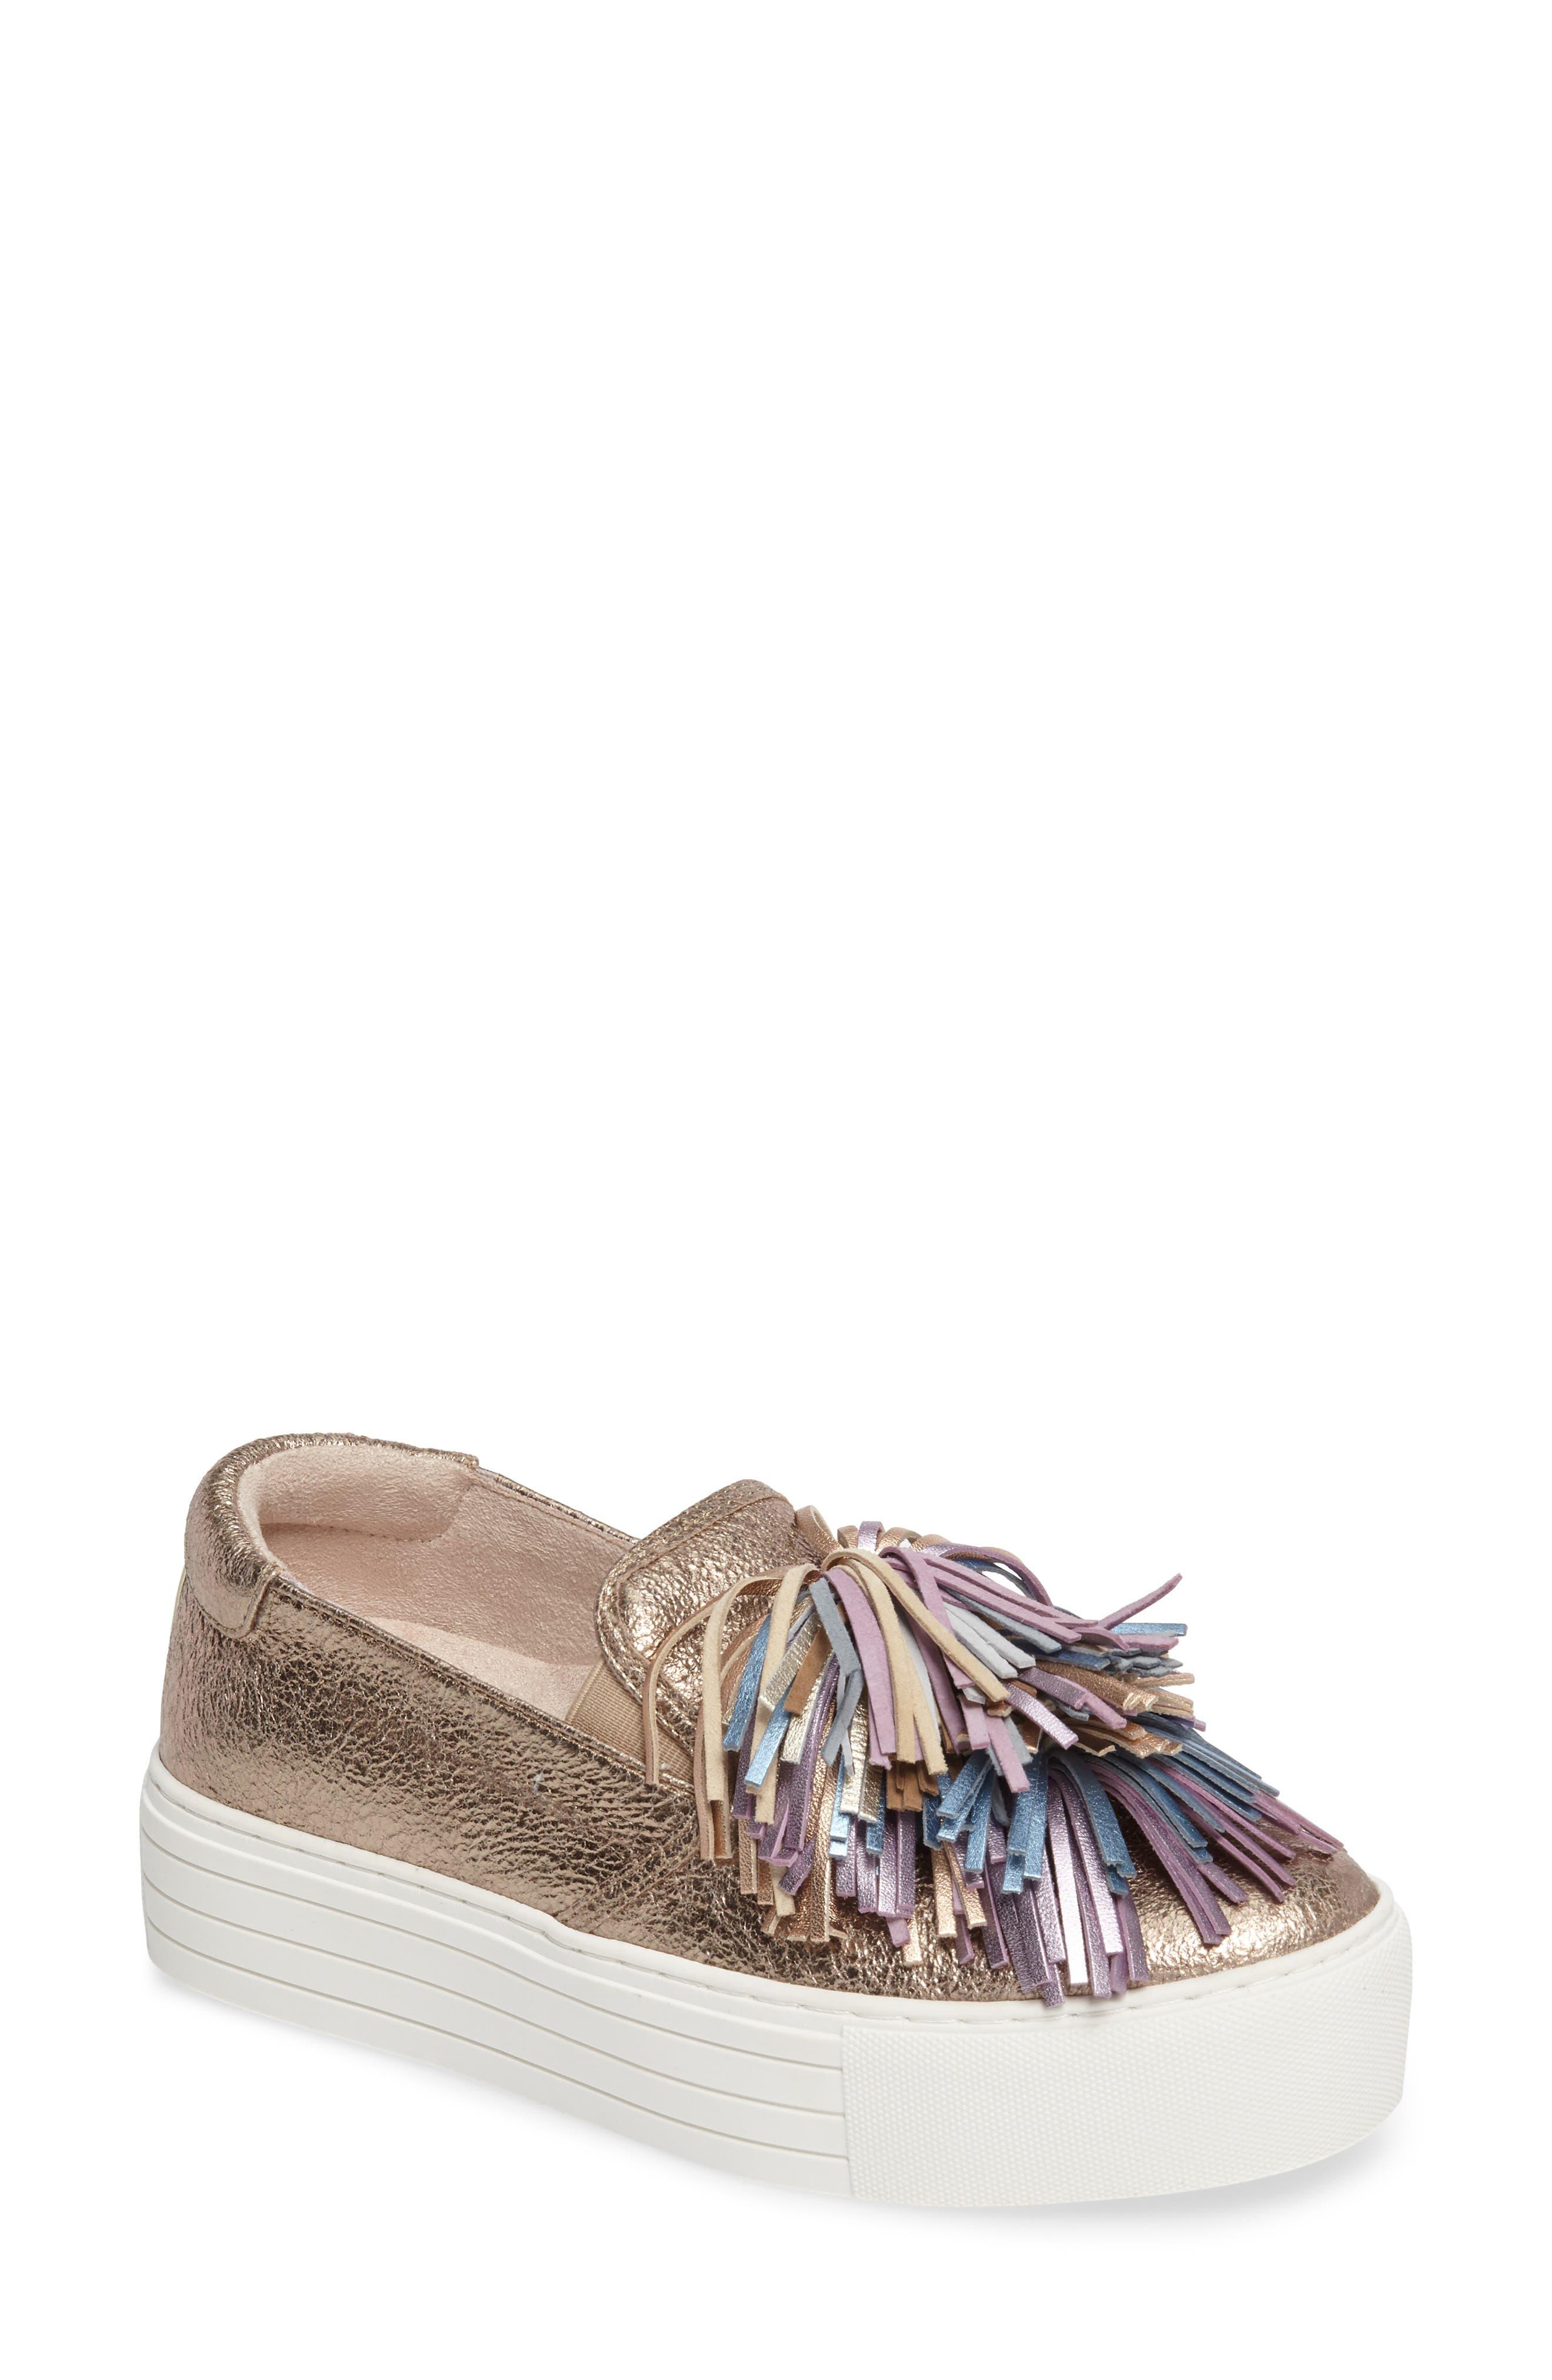 Main Image - Kenneth Cole New York Jayson Pom Platform Sneaker (Women)